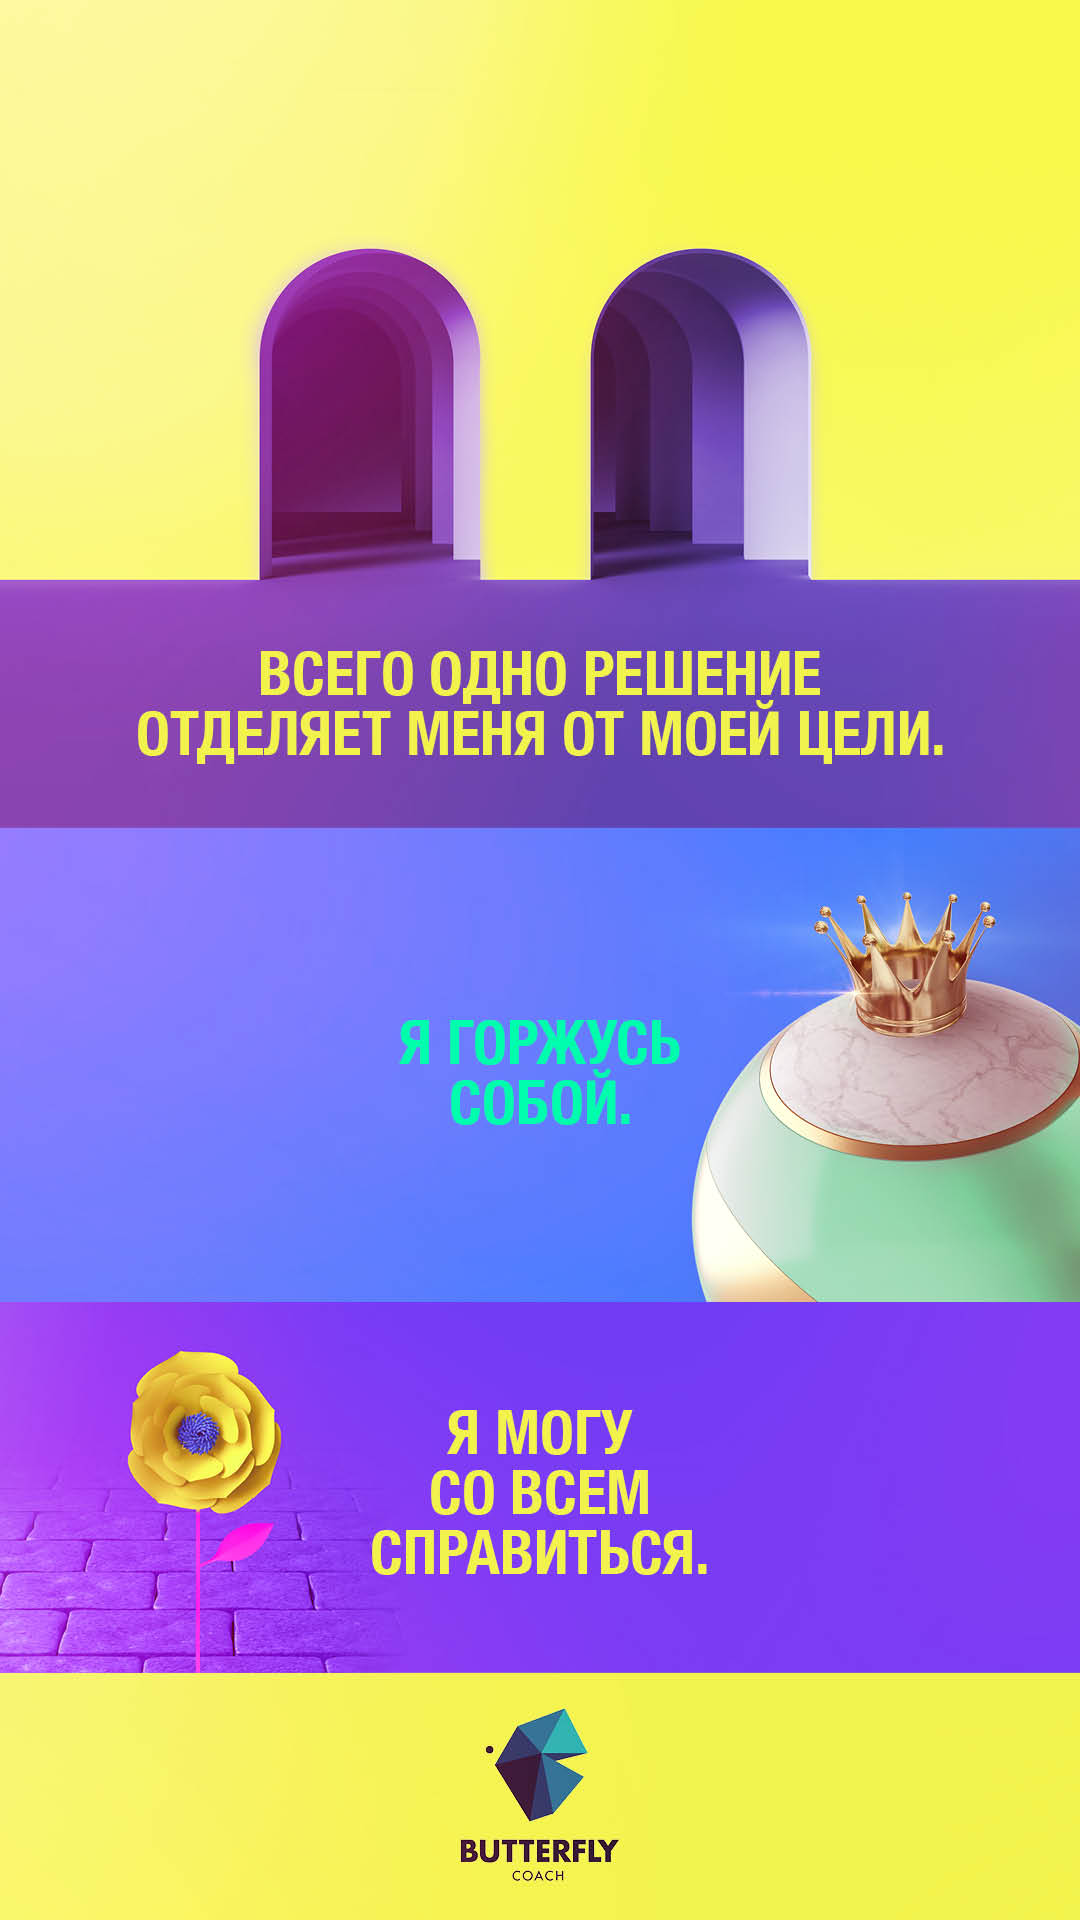 BFC_Manifesto_Hochformat_BOLD12